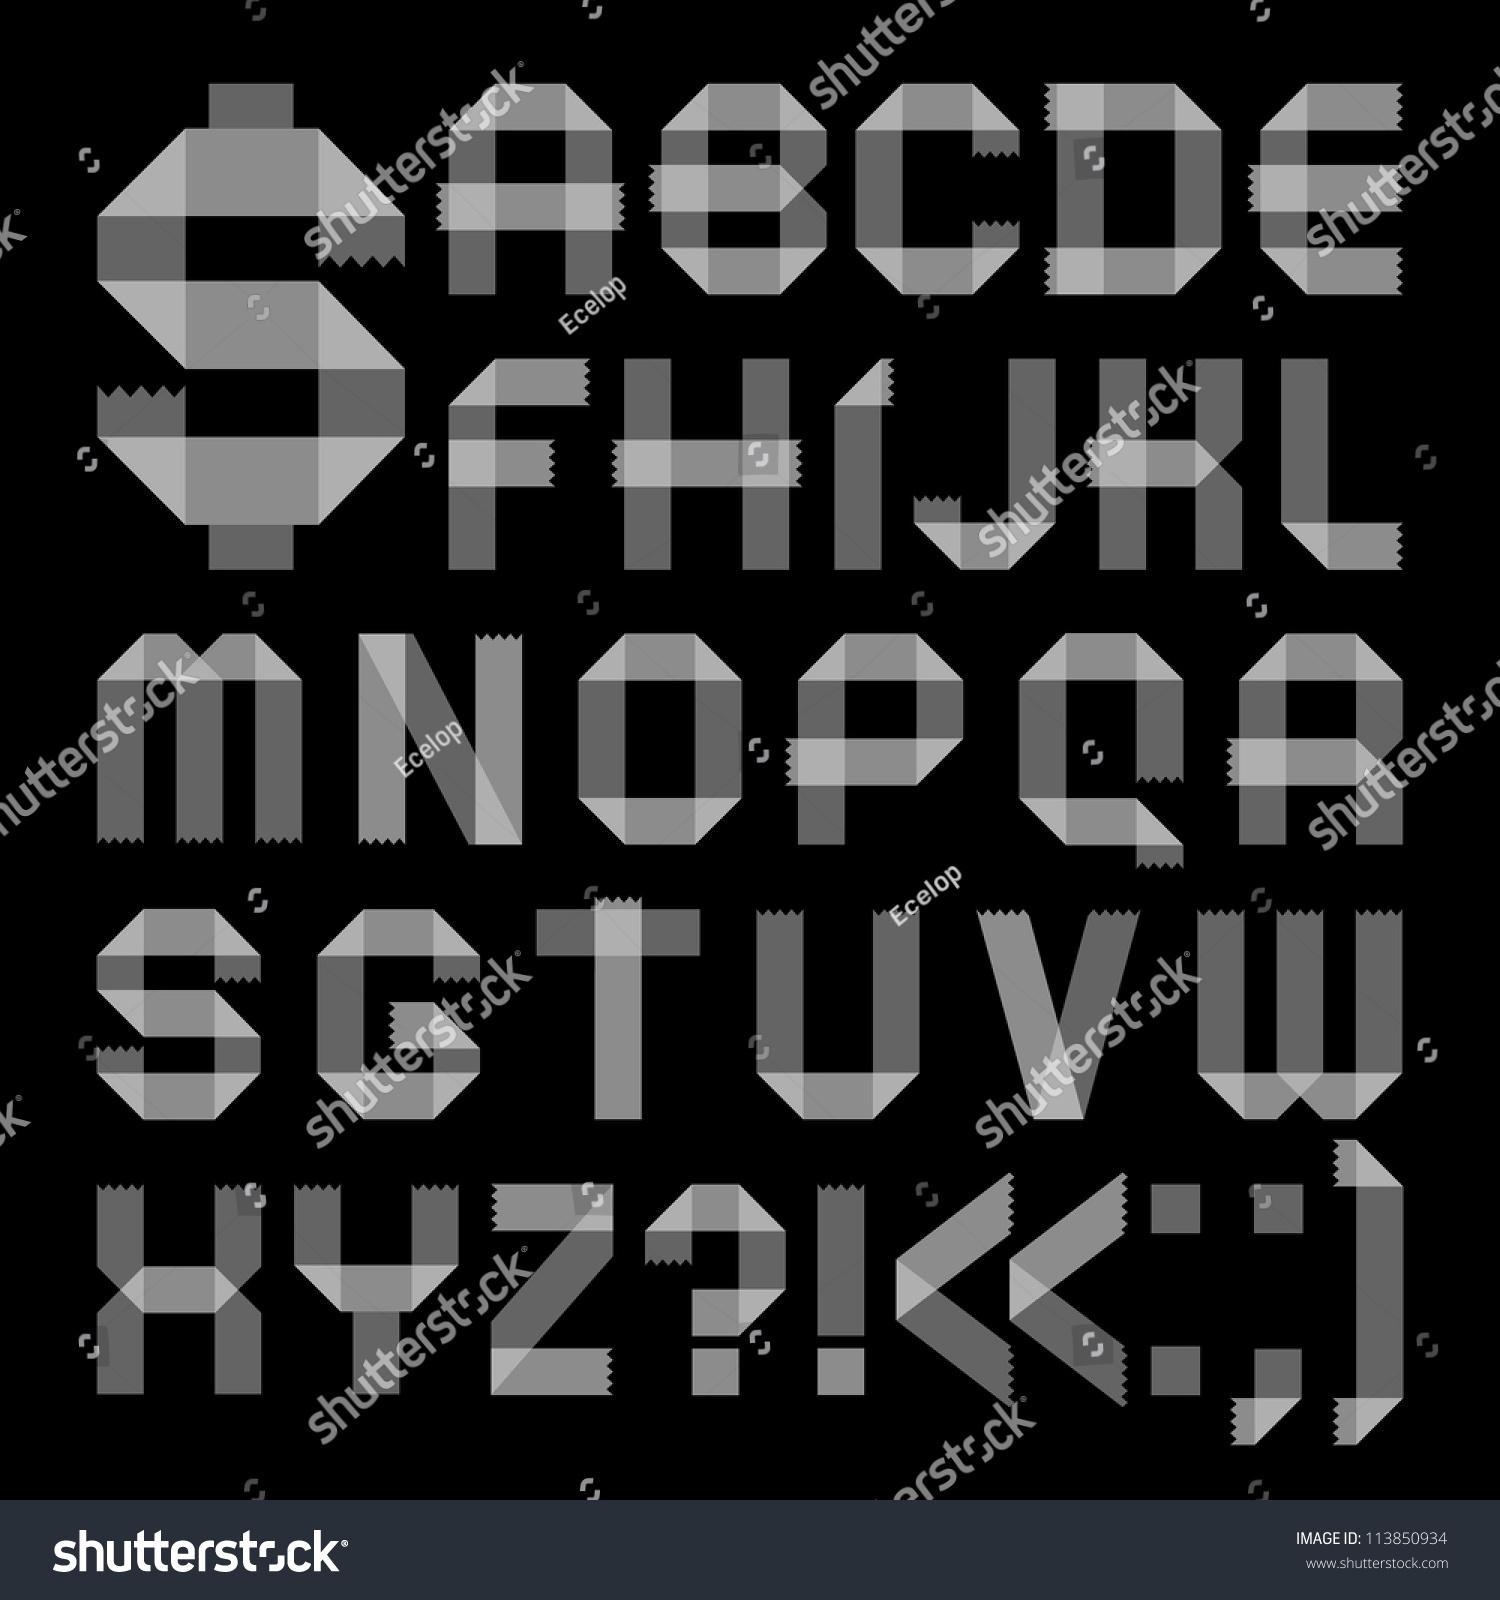 Font from sellotape tape roman alphabet a b c d e f g h i j k l m n o p q r s t u v w x y